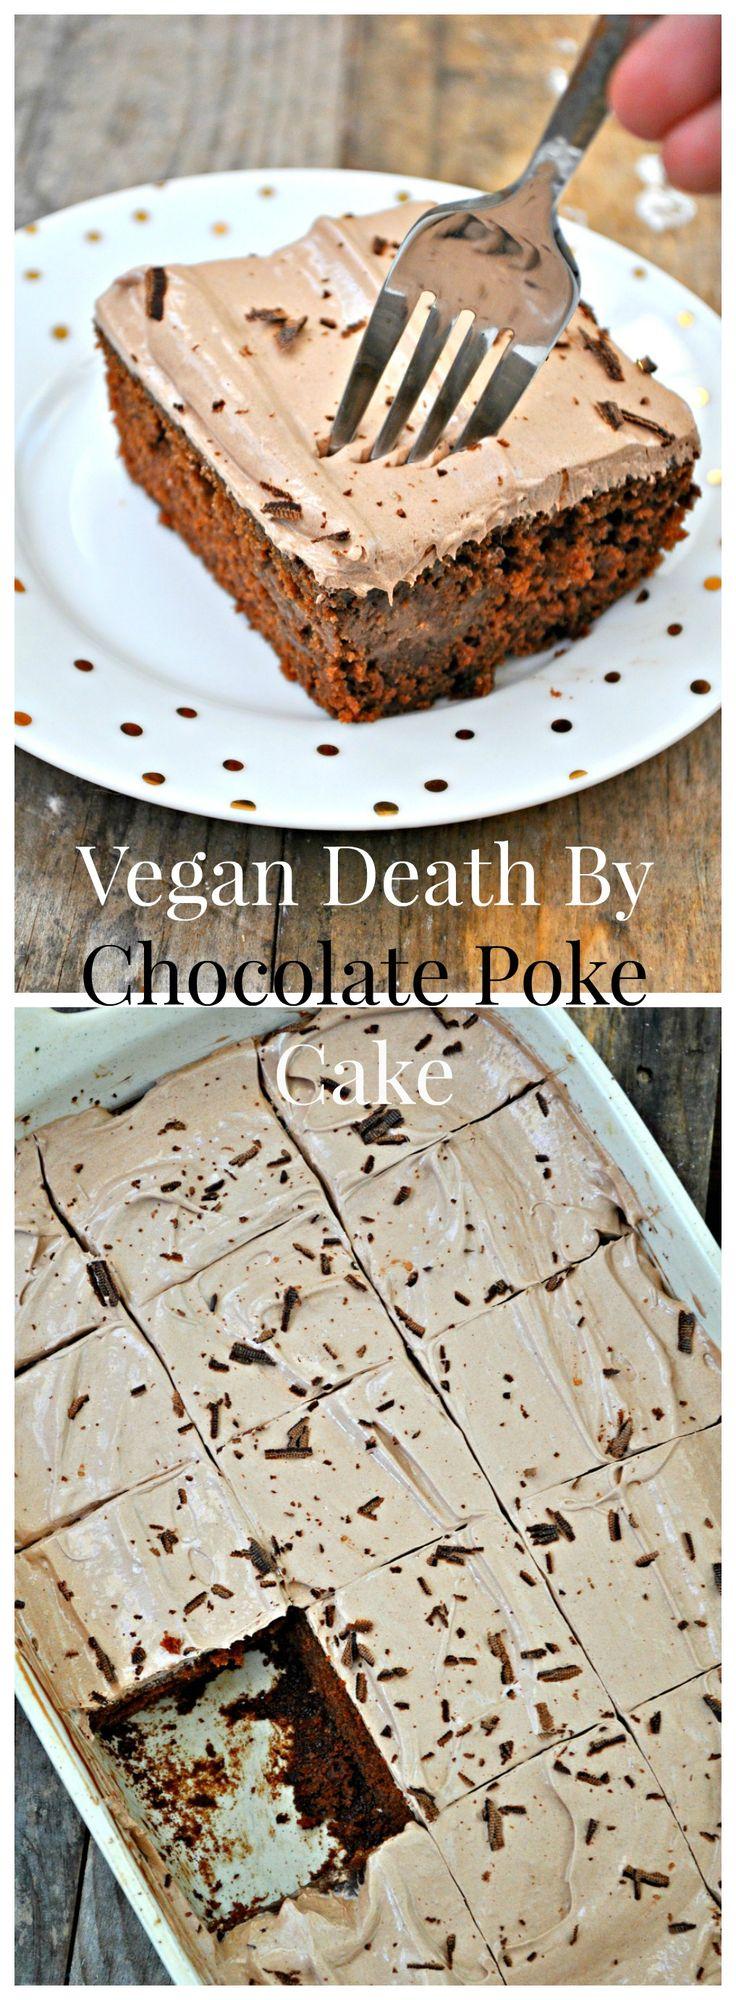 Vegan Death By Chocolate Poke Cake | follow @sophieeleana